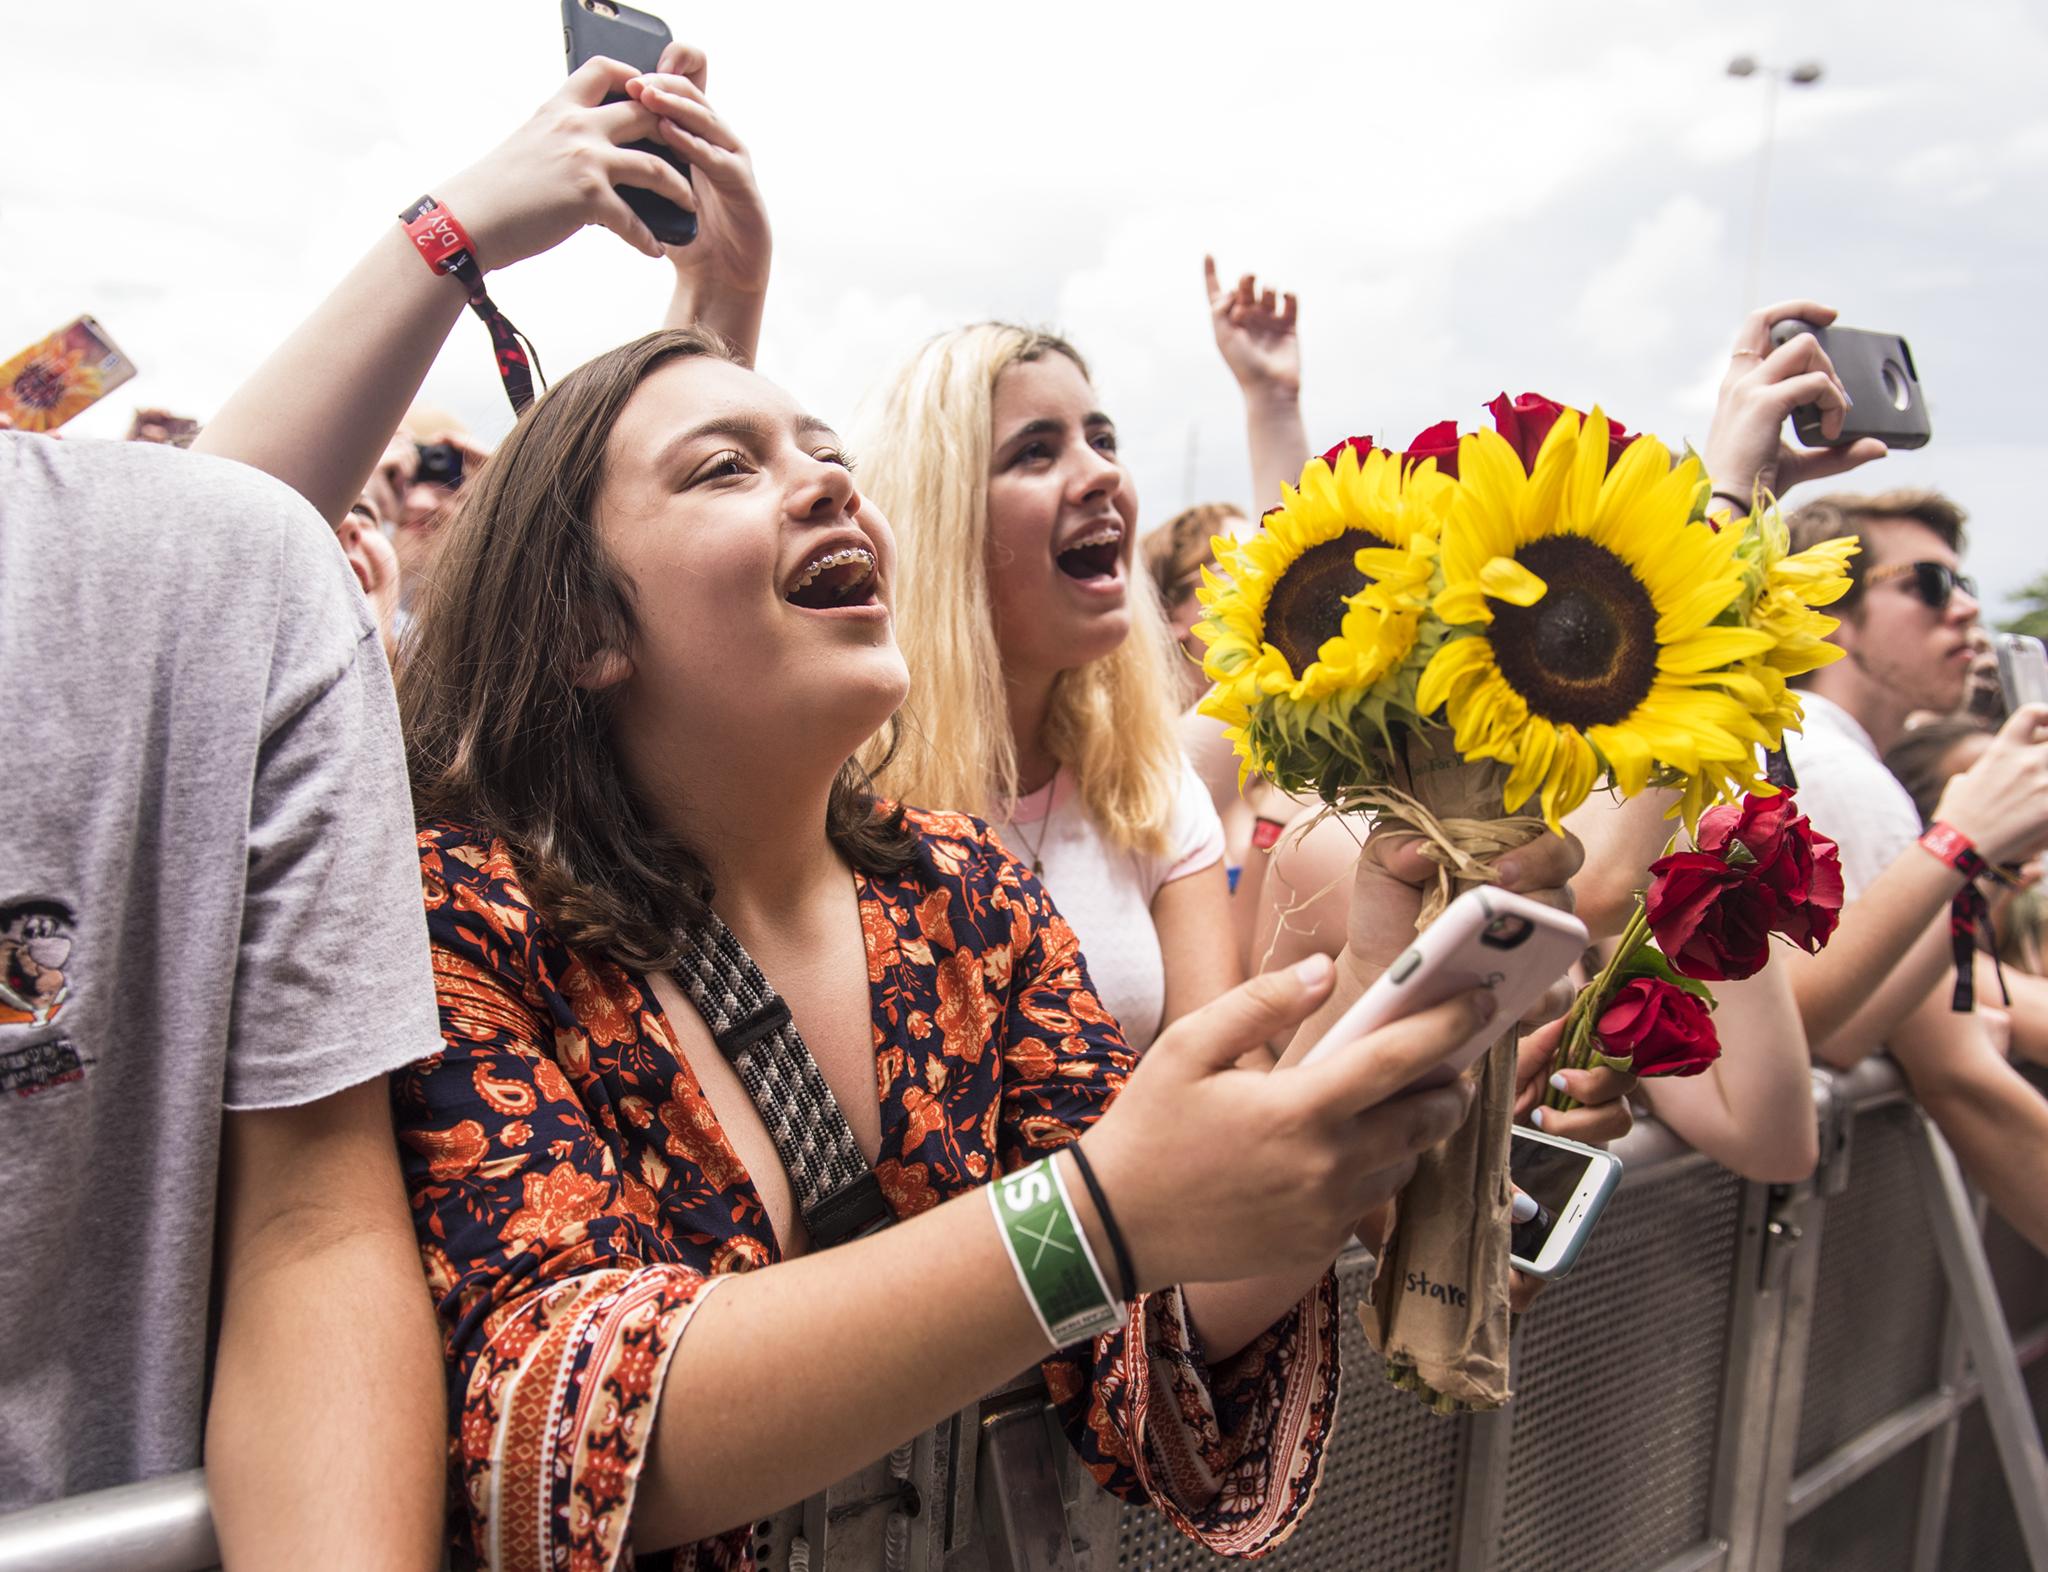 Free Press Summer Festival // Photo by David Brendan Hall